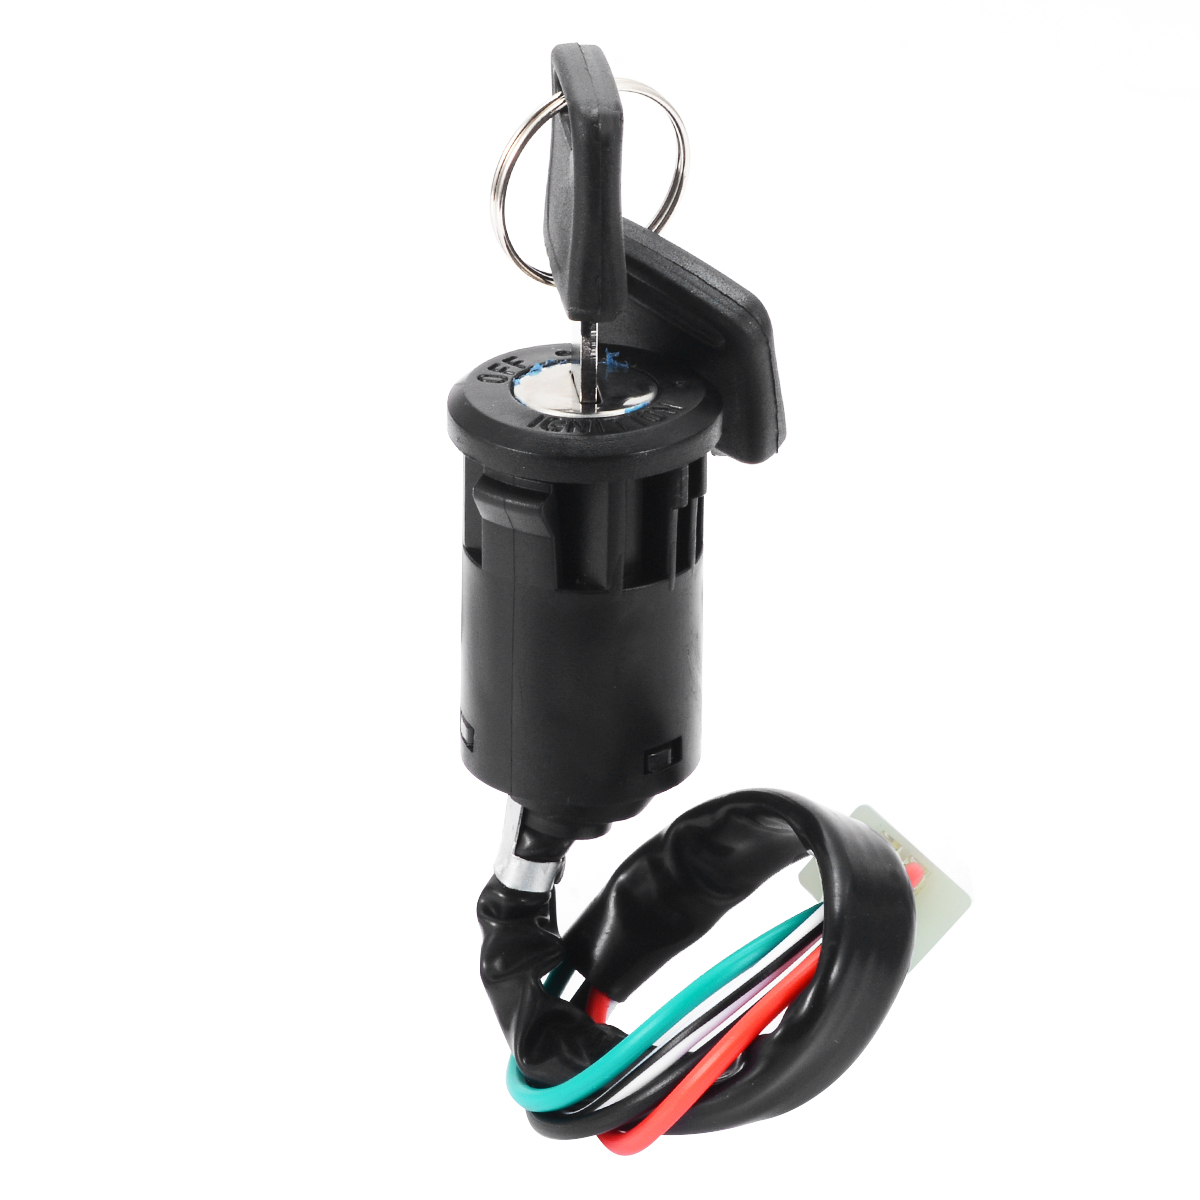 Universal Motorbike Ignition Kits 4 Wire ATV Ignition Switch+Key For 50 70 90 110 125 150 200 250CC Motorbike ATV Quad Dirt Bike